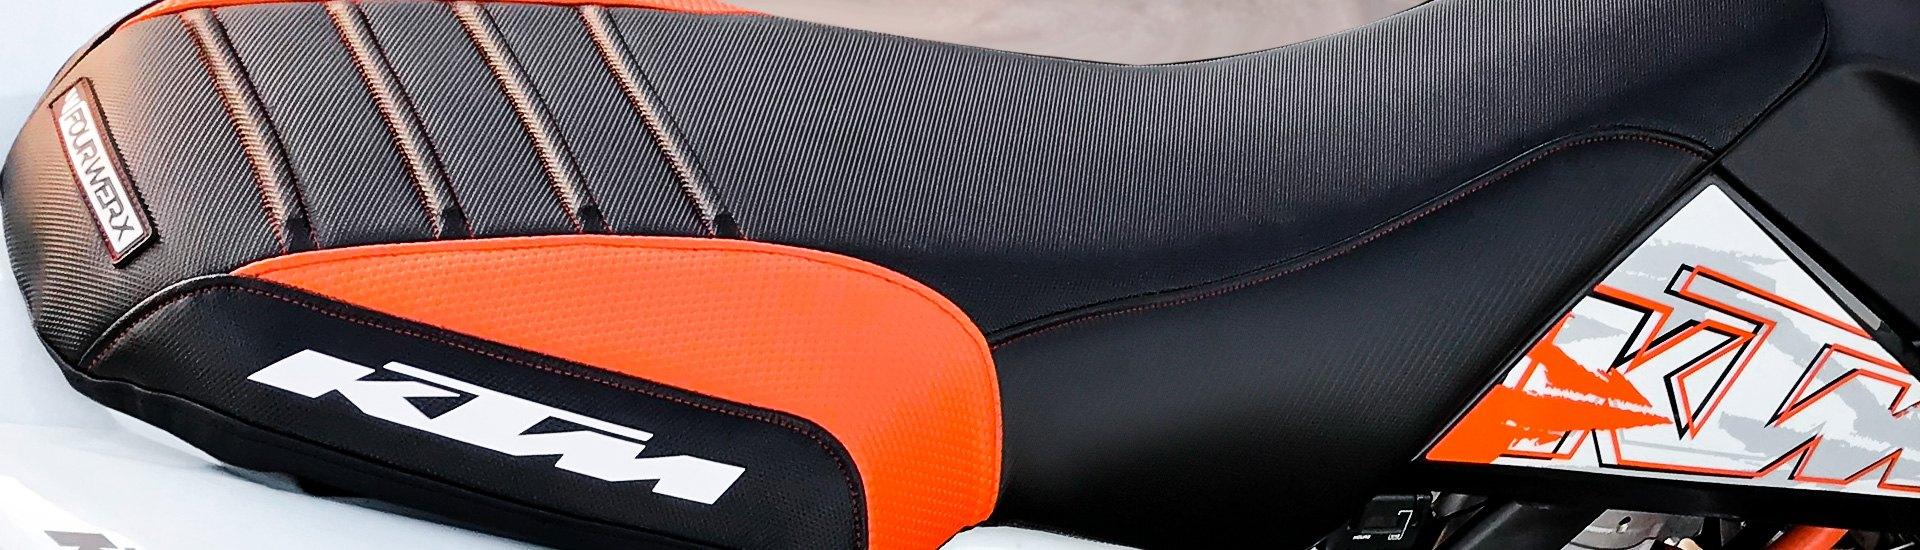 Polaris Scrambler Sport Trailblazer 250 400 500 Replacement ATV Seat Cover